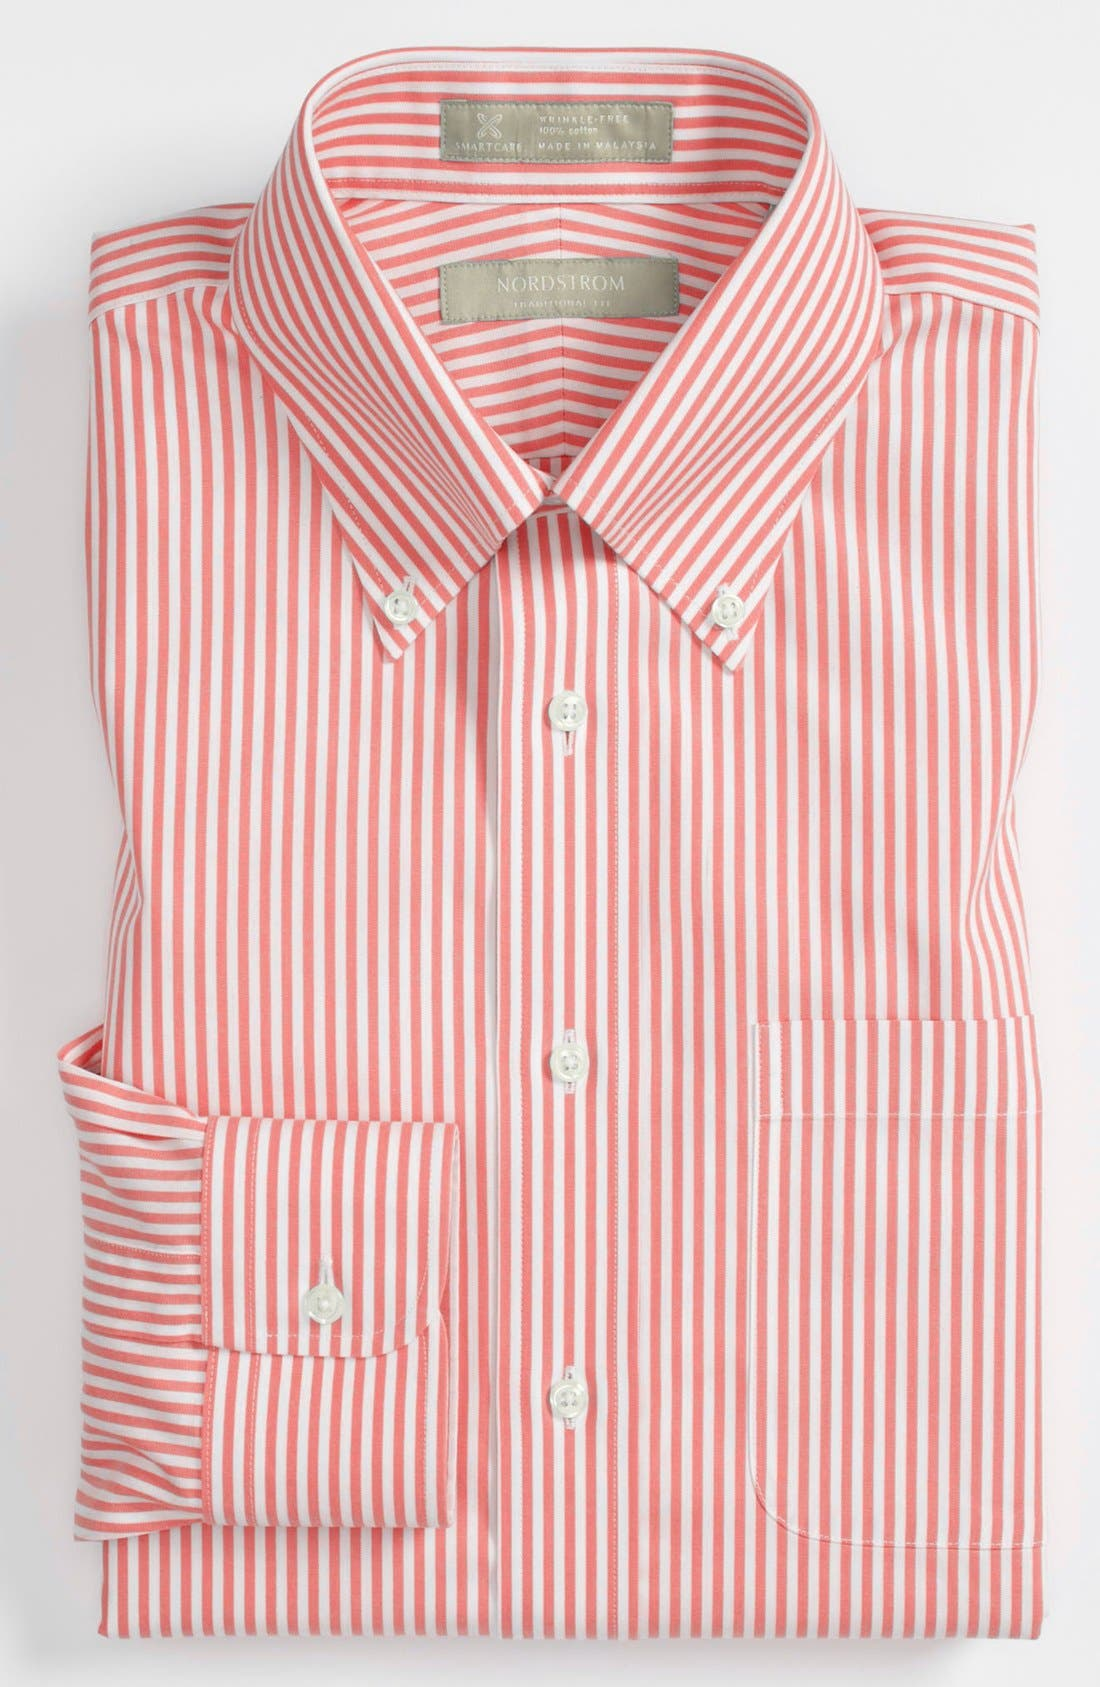 Main Image - Nordstrom Men's Shop Smartcare™ Traditional Fit Dress Shirt